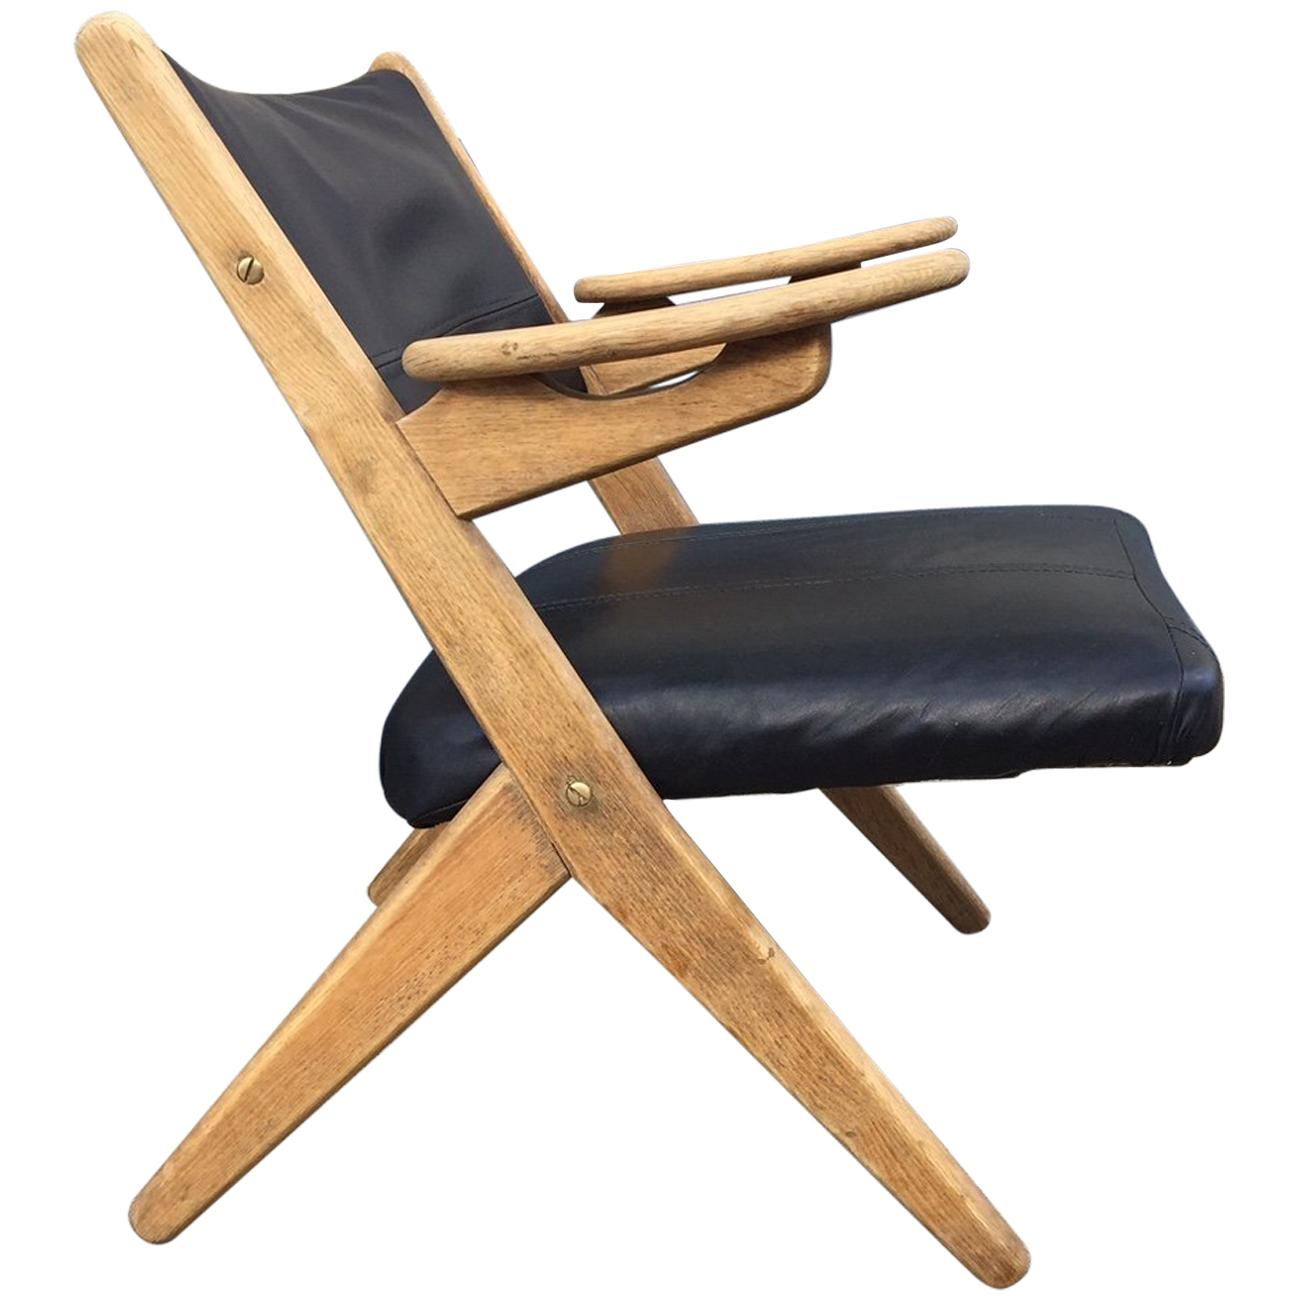 Danish Modern Oak and Black Leather Lounge Chair by Arne Hovmand Olsen, 1960s